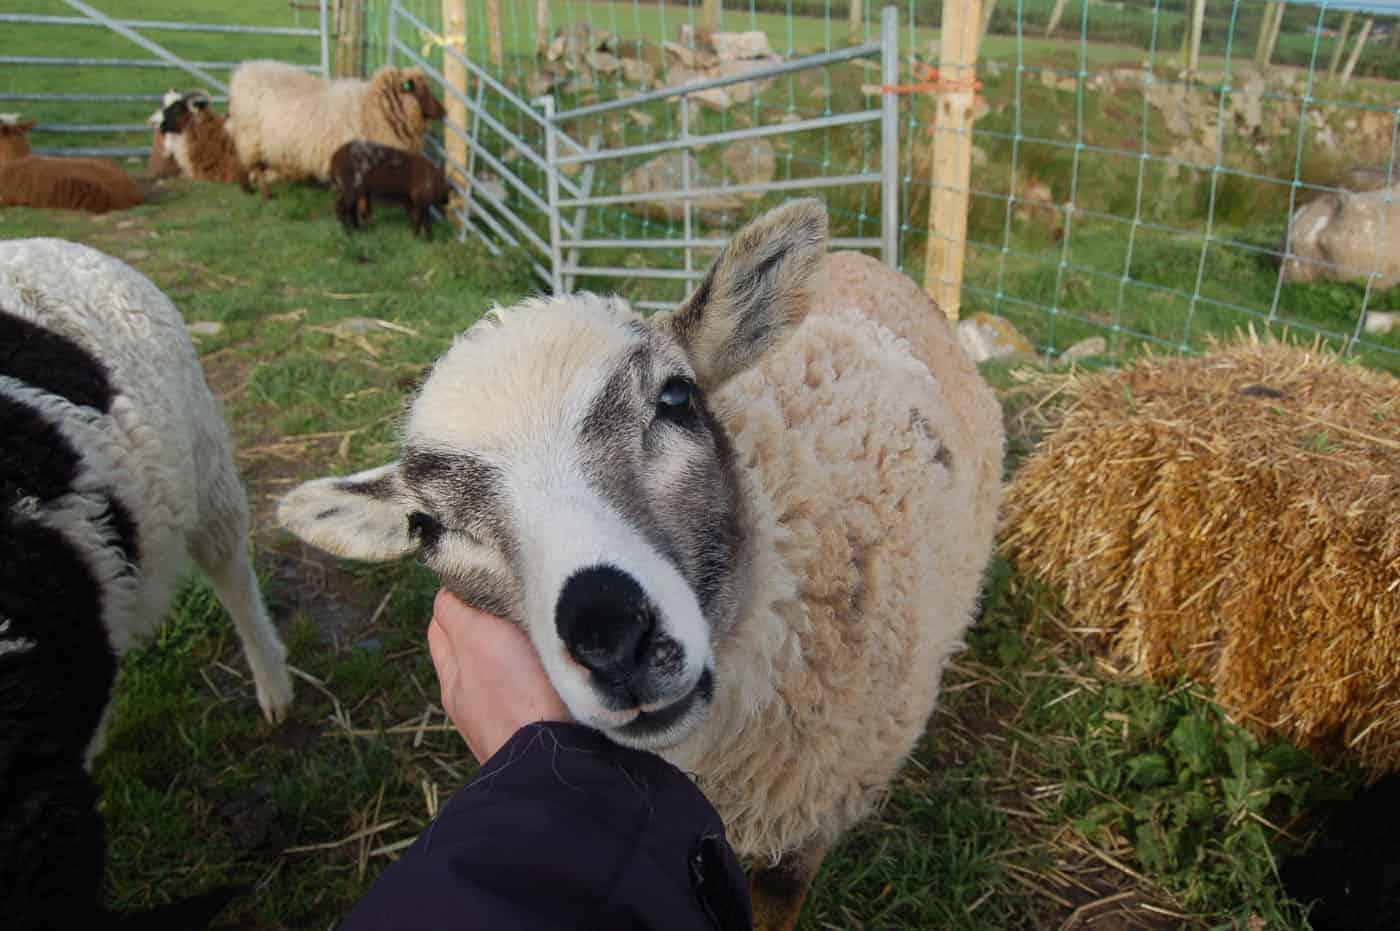 patchwork sheep sweet pet smudge cute lamb golden soay cross shetland jacob sheep